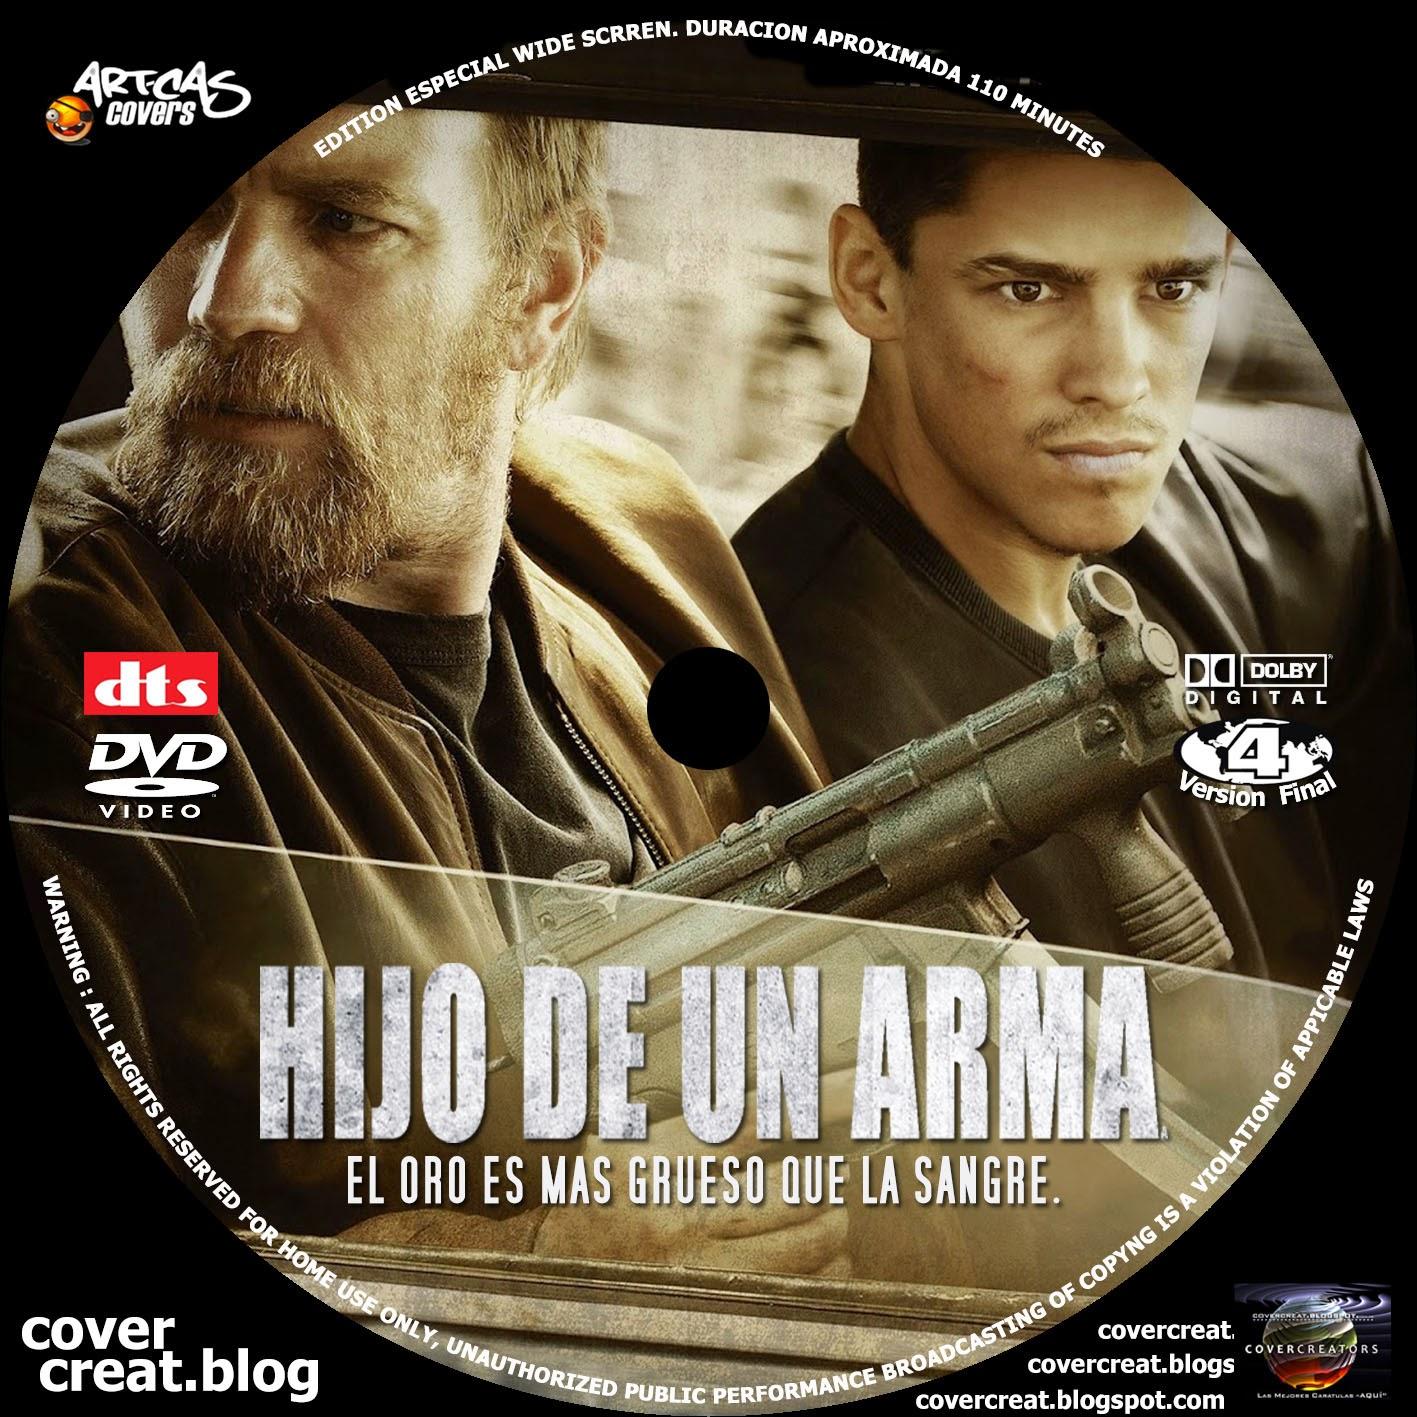 CD COVERCREATORS: SON OF A GUN DVD